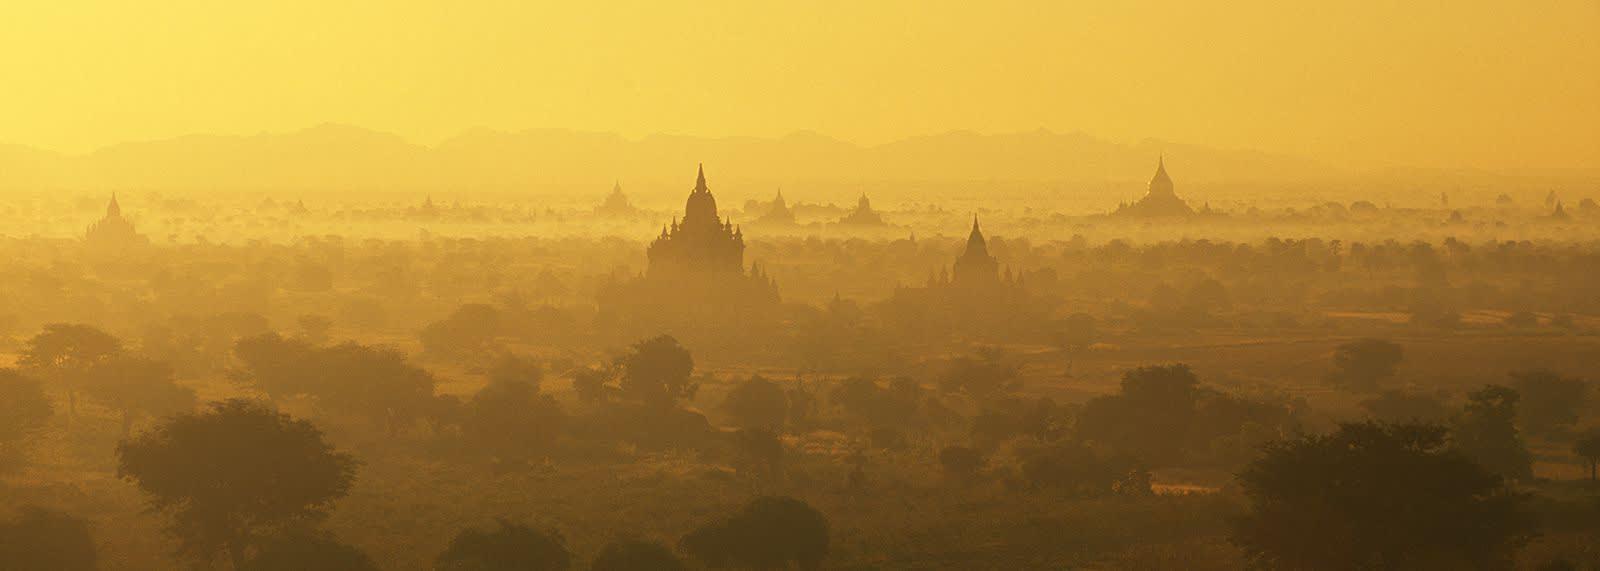 Matjaž Krivic, Bagan, Myanmar, 2002 – 2006